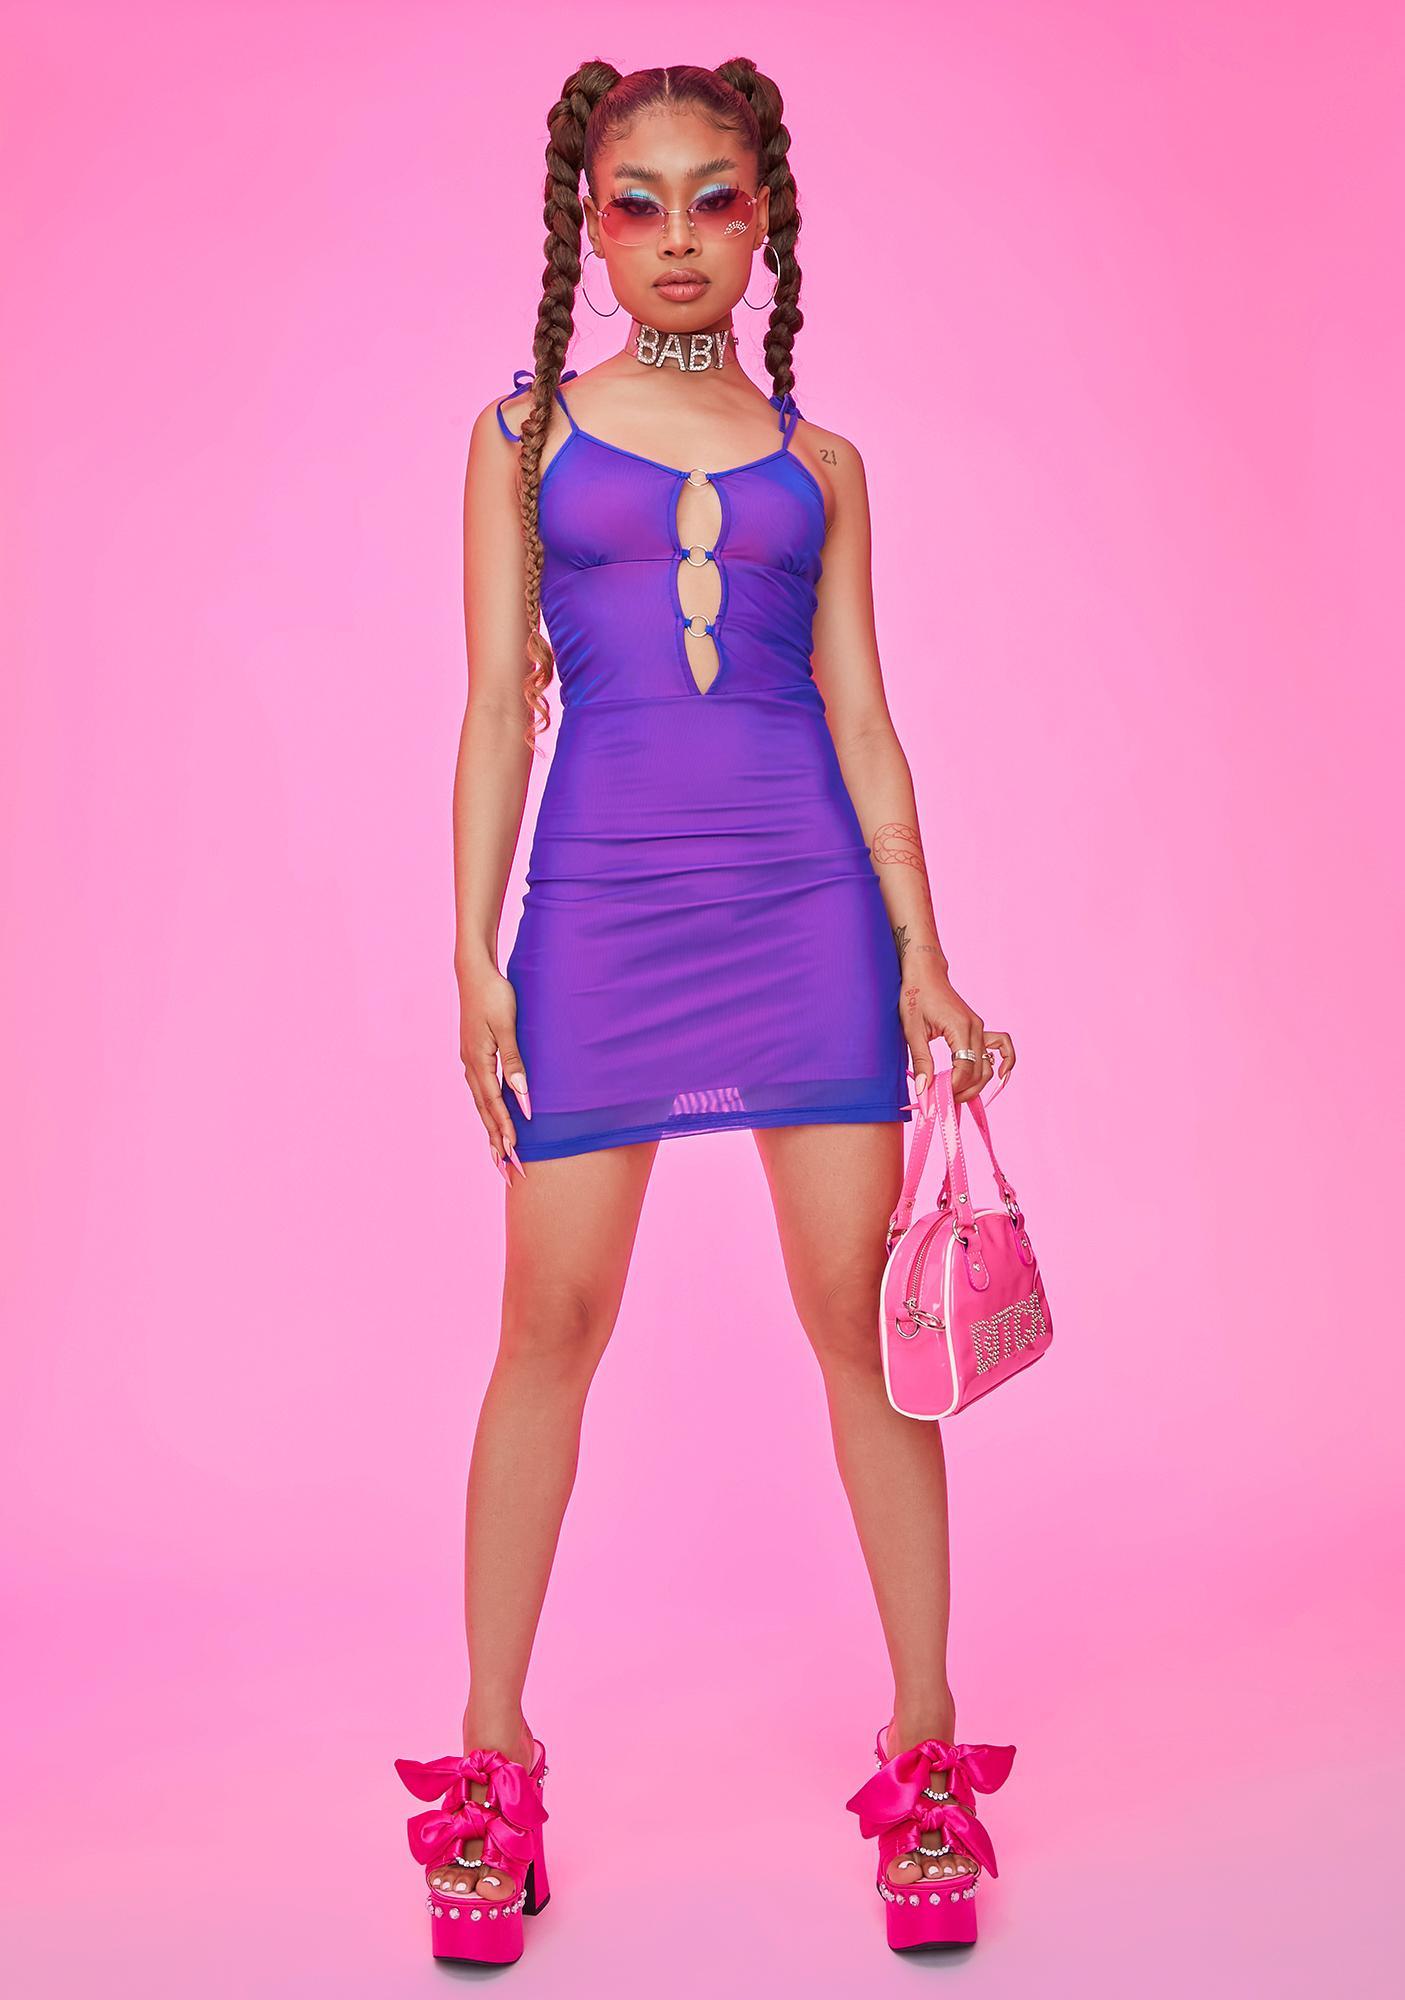 HOROSCOPEZ Ego Trip Cut Out Mesh Dress